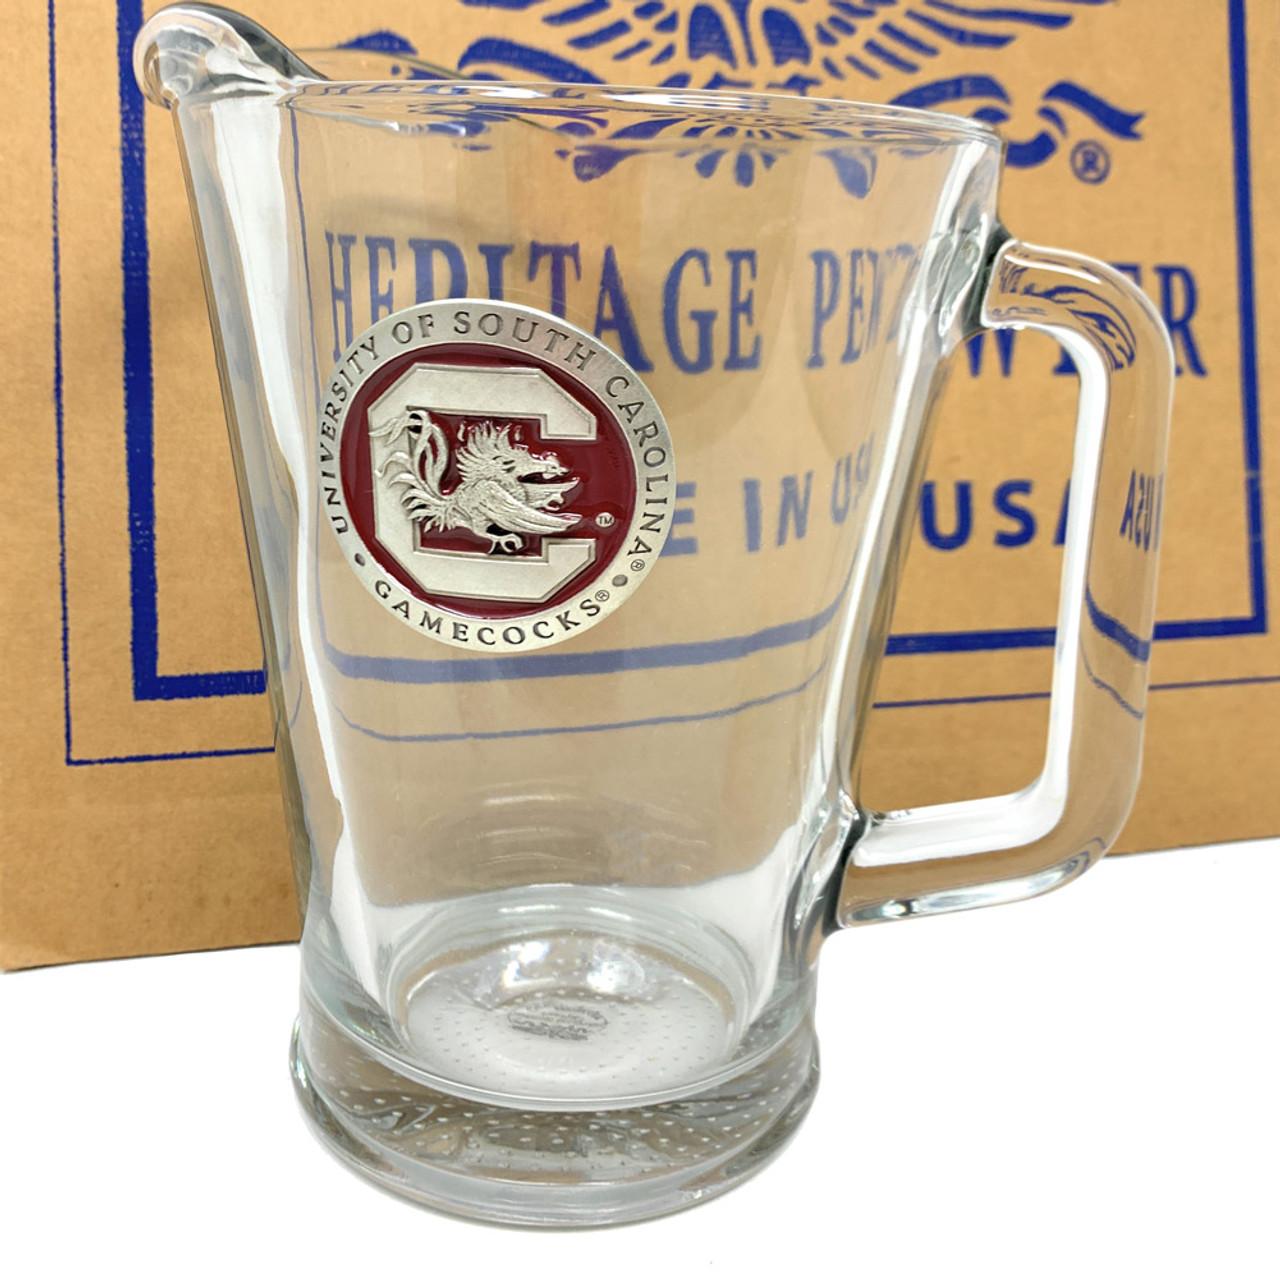 Arizona State University Pitcher and 2 Pint Glass Set Beer Set